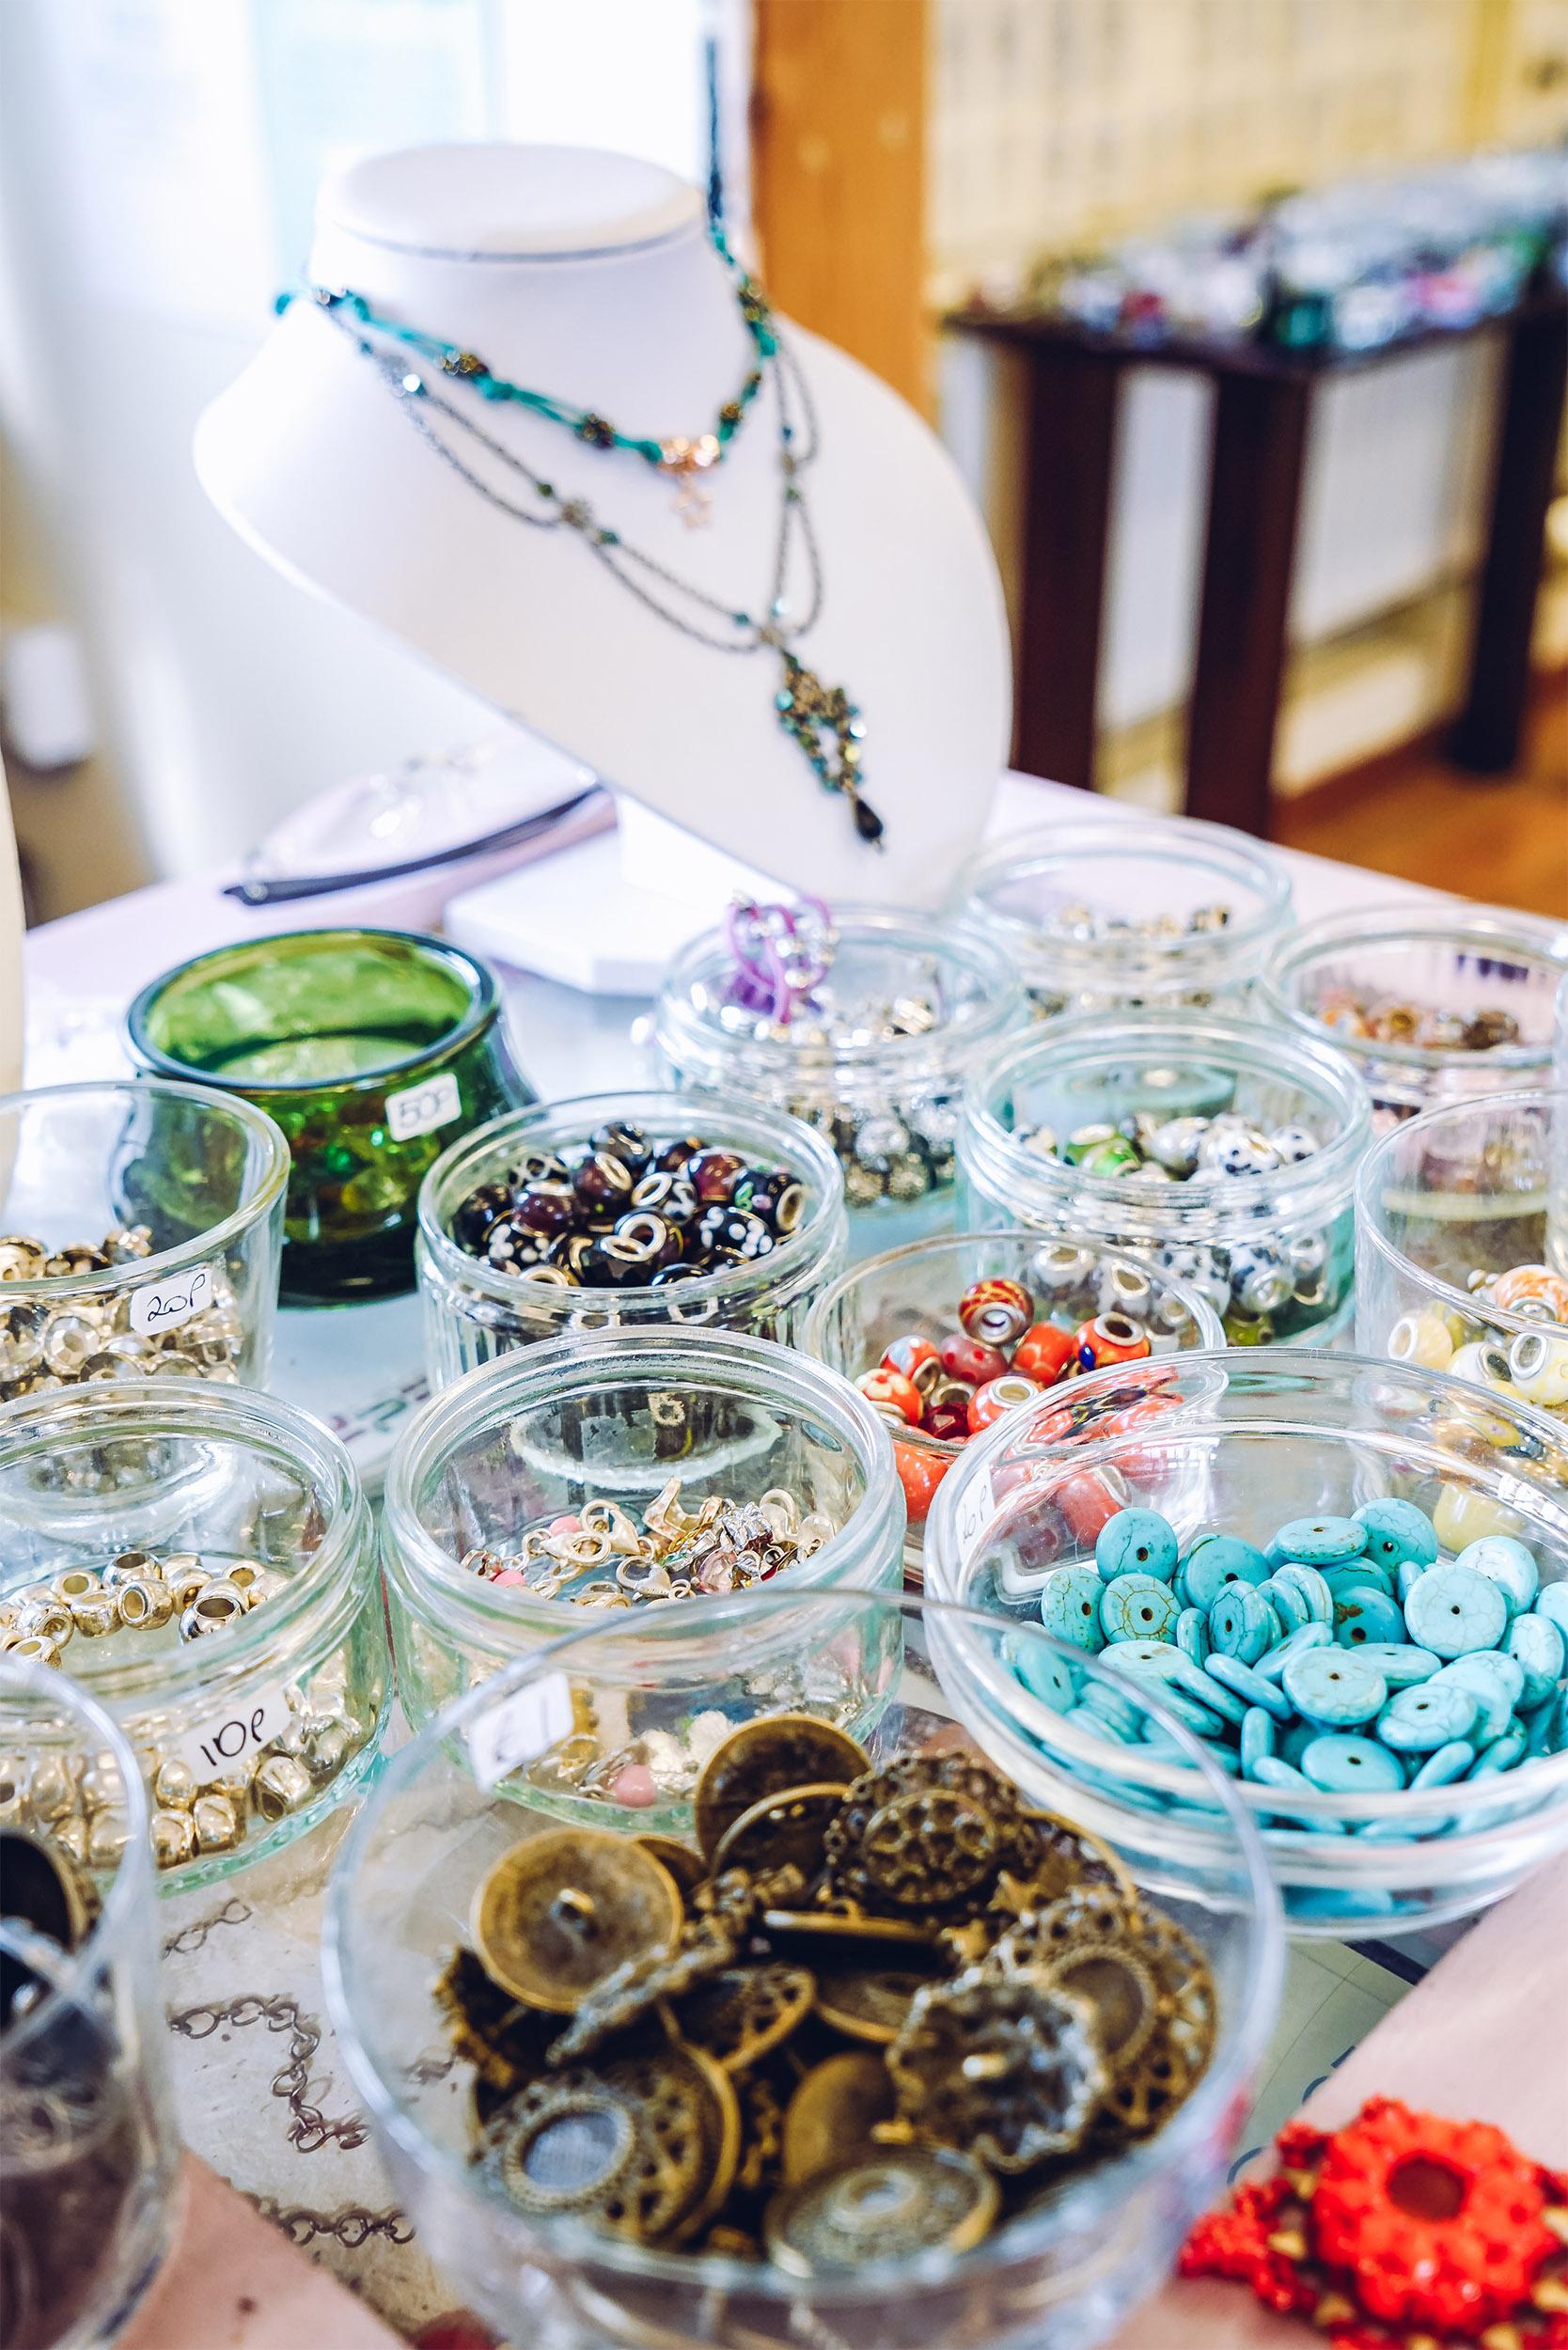 Deborah Beads - Colchester - Bead Shop 11.jpg